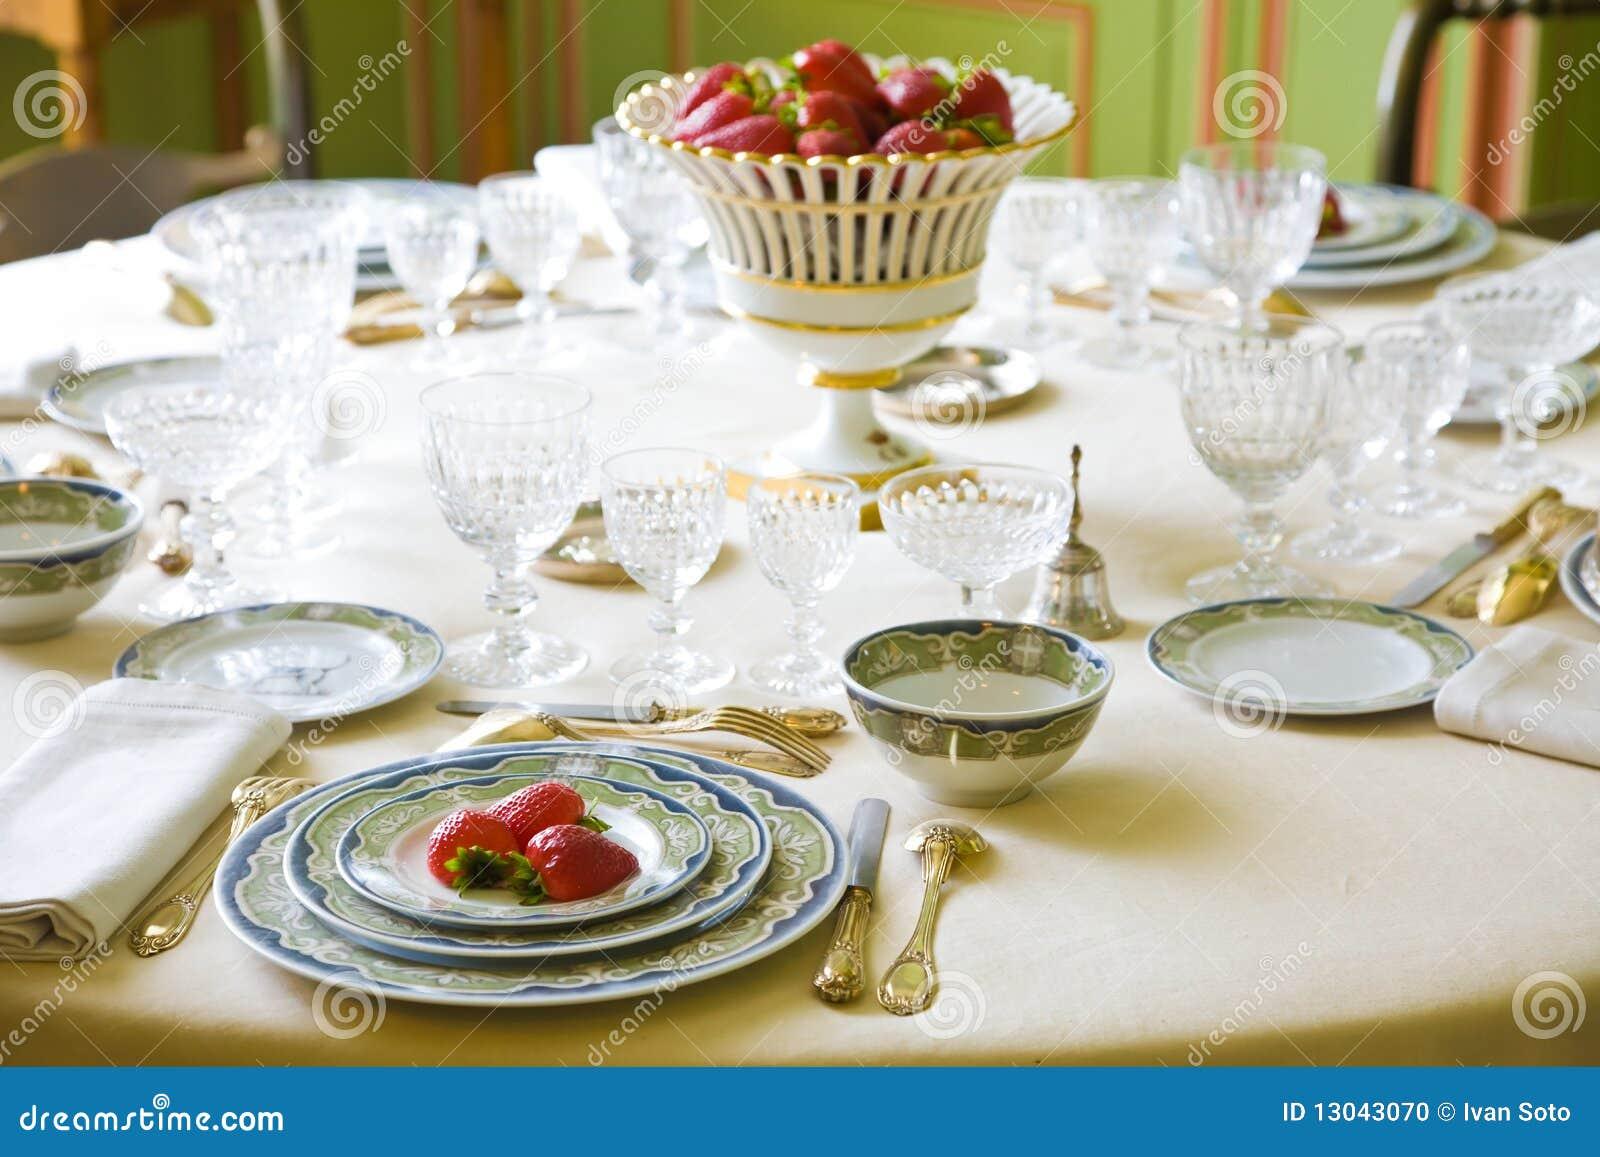 Luxury Table Setting Stock Photo Image 13043070 & Luxury Table Settings - Castrophotos